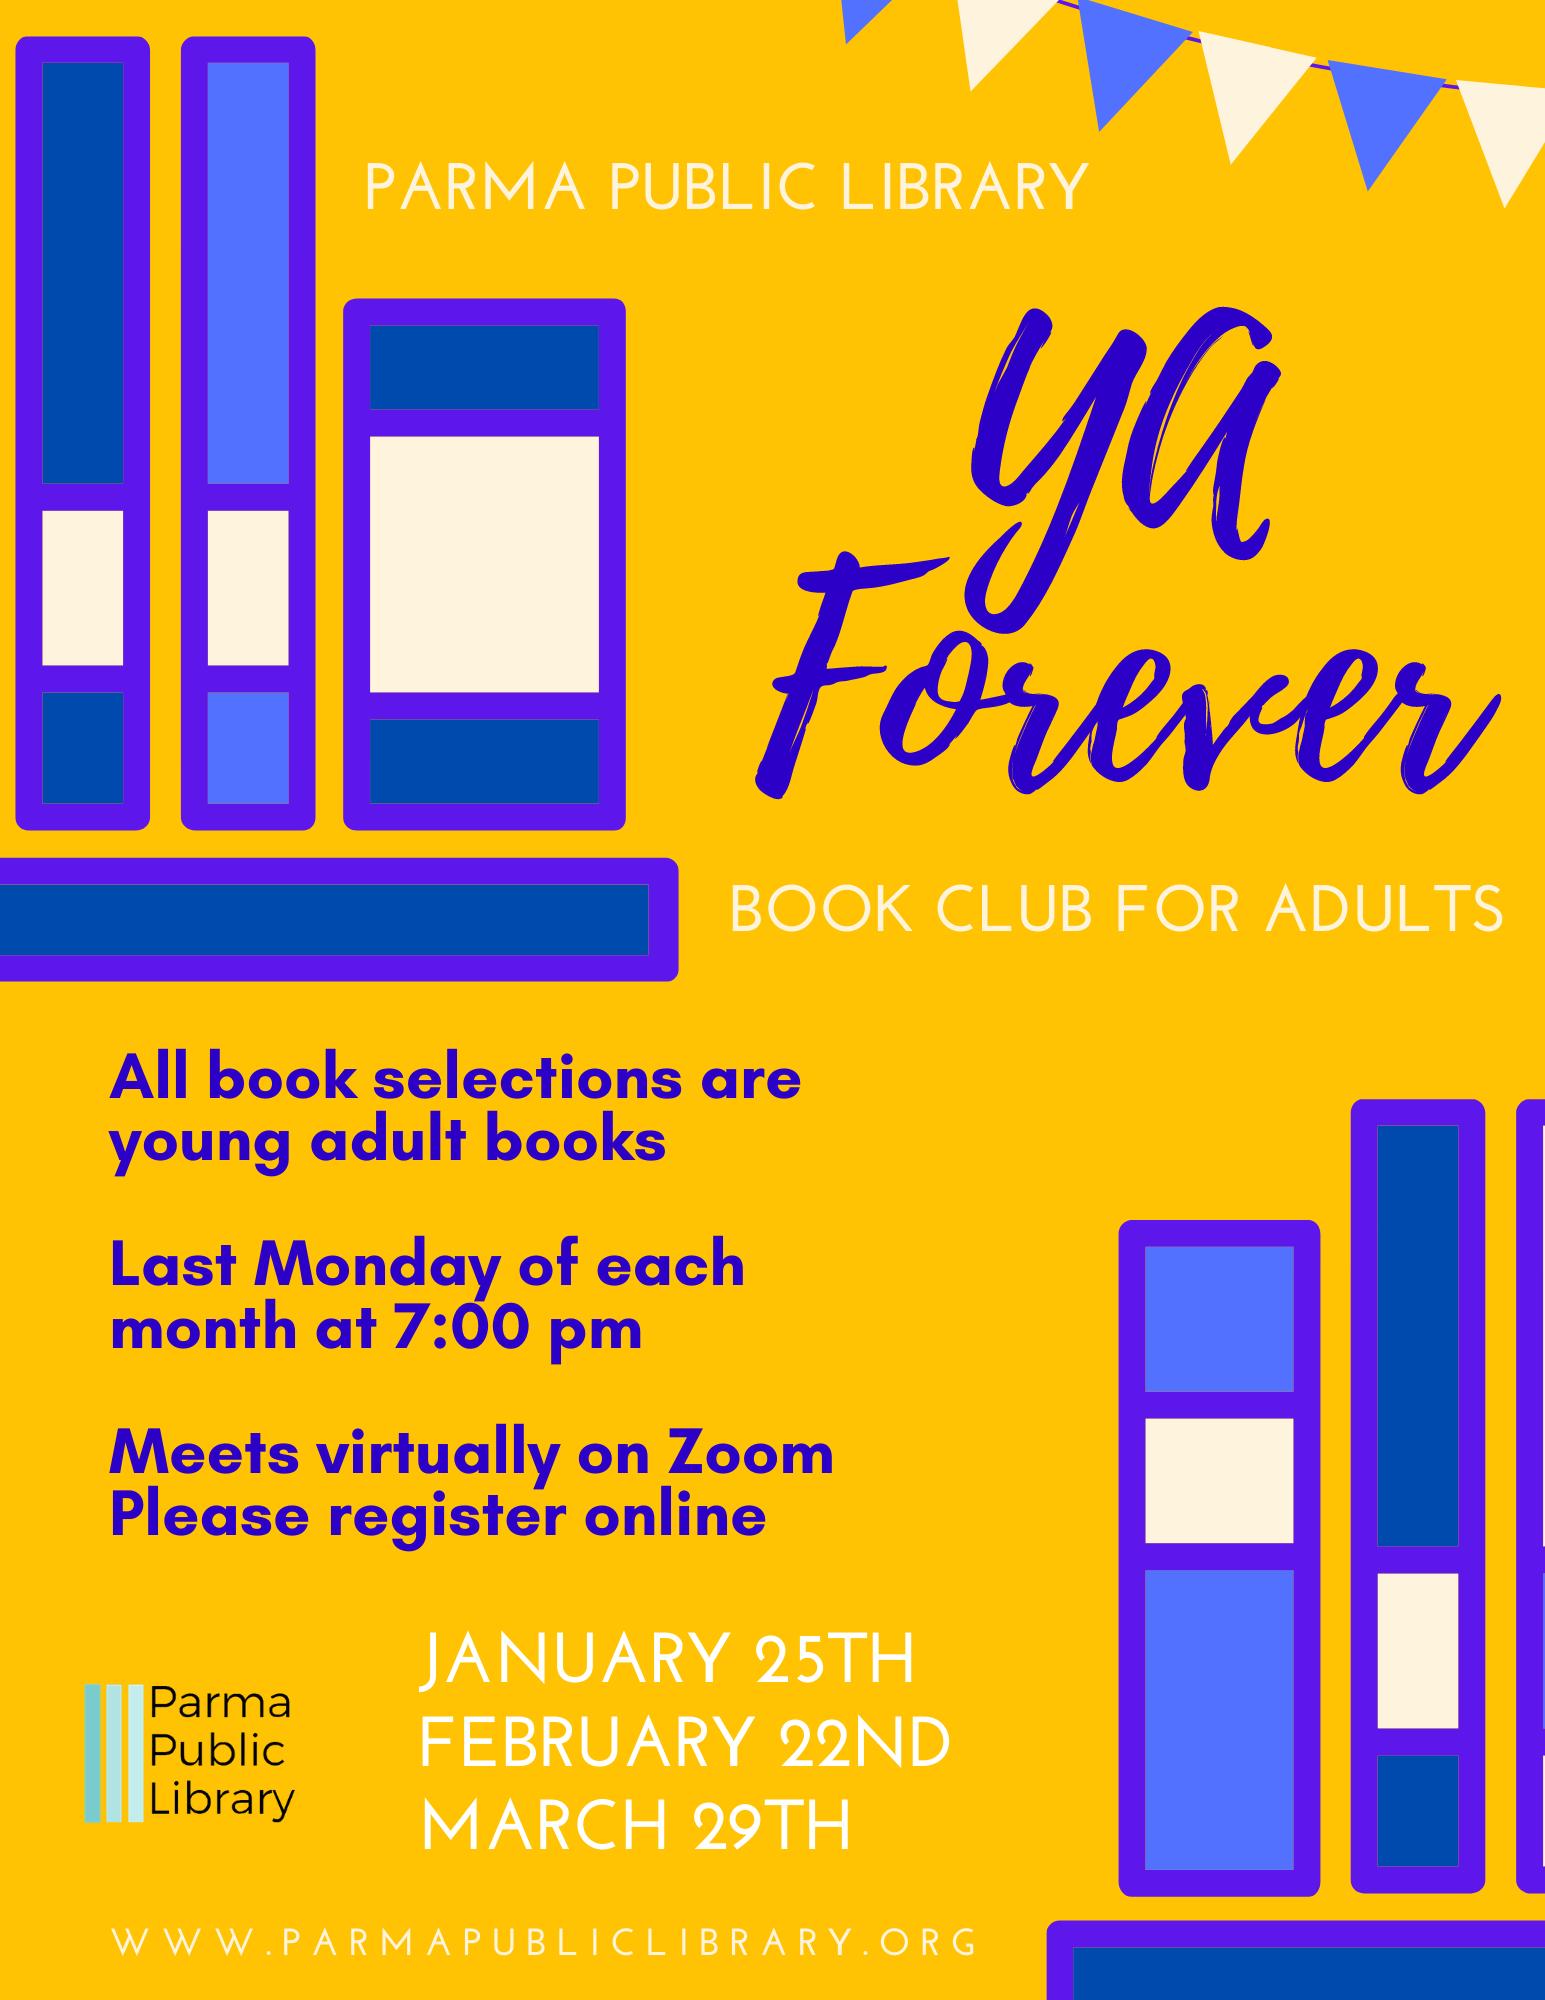 YA Forever Book Club for Adults-VIRTUAL